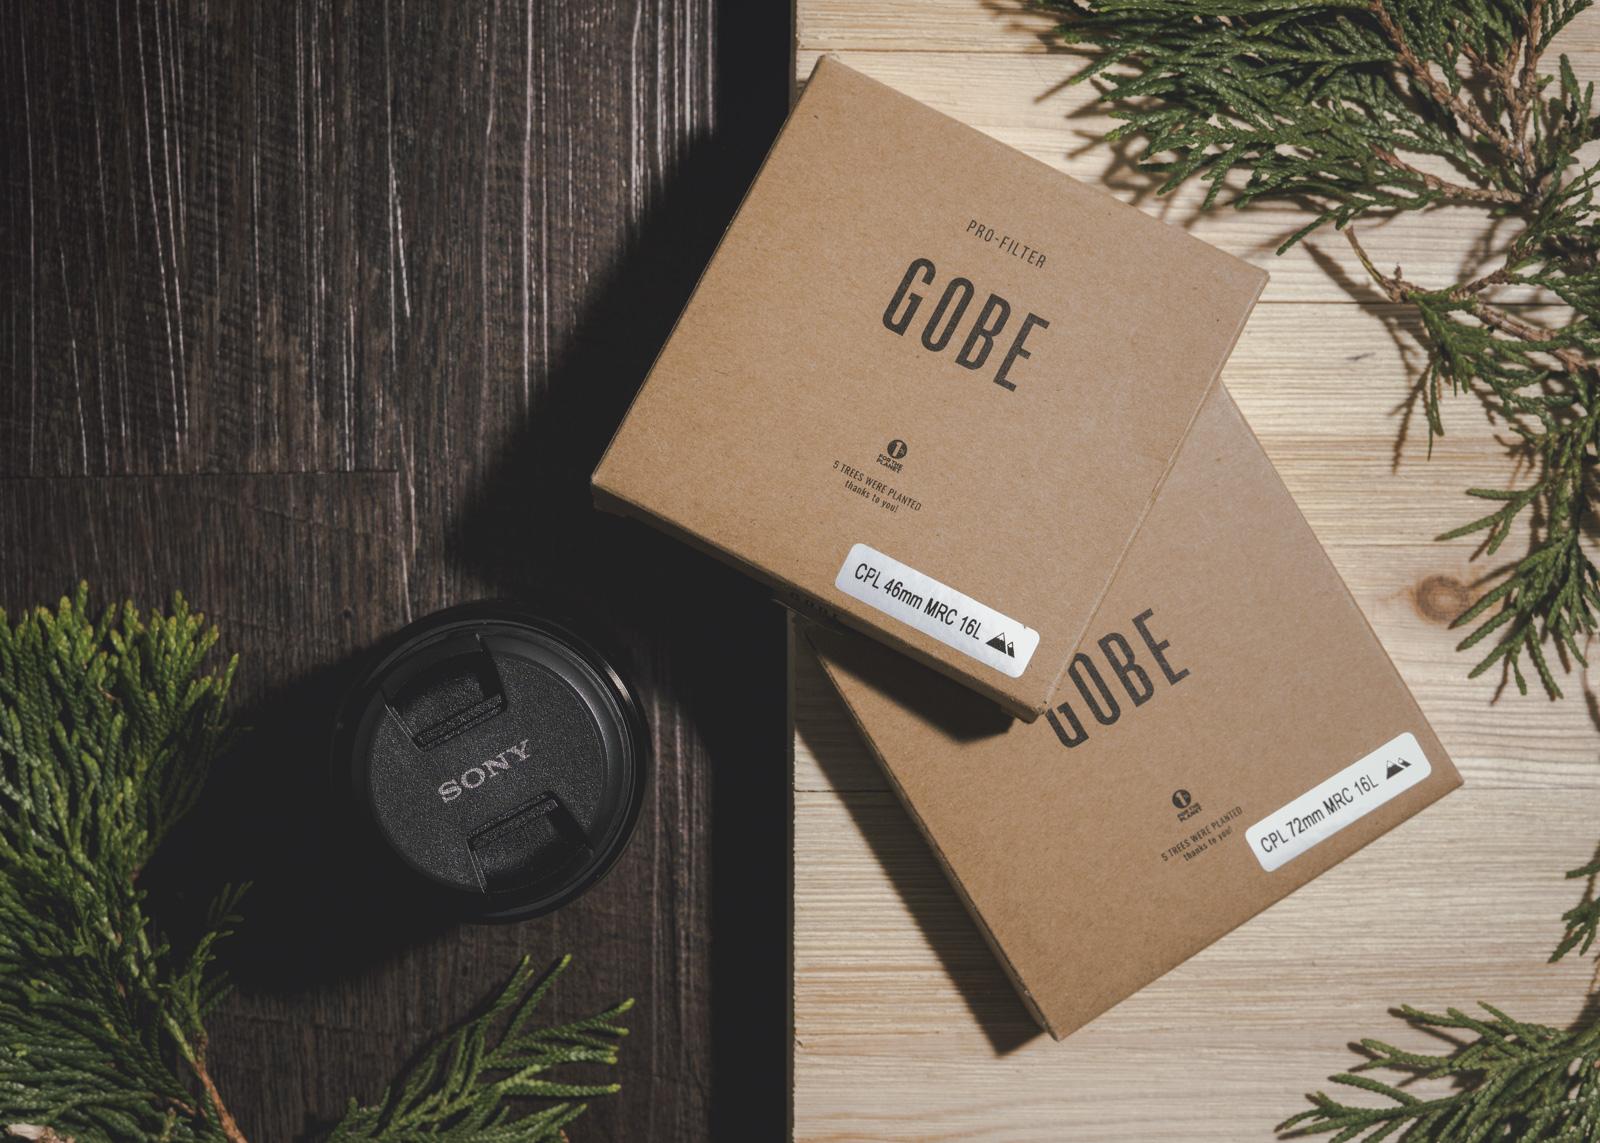 Gobe Camera Filteres